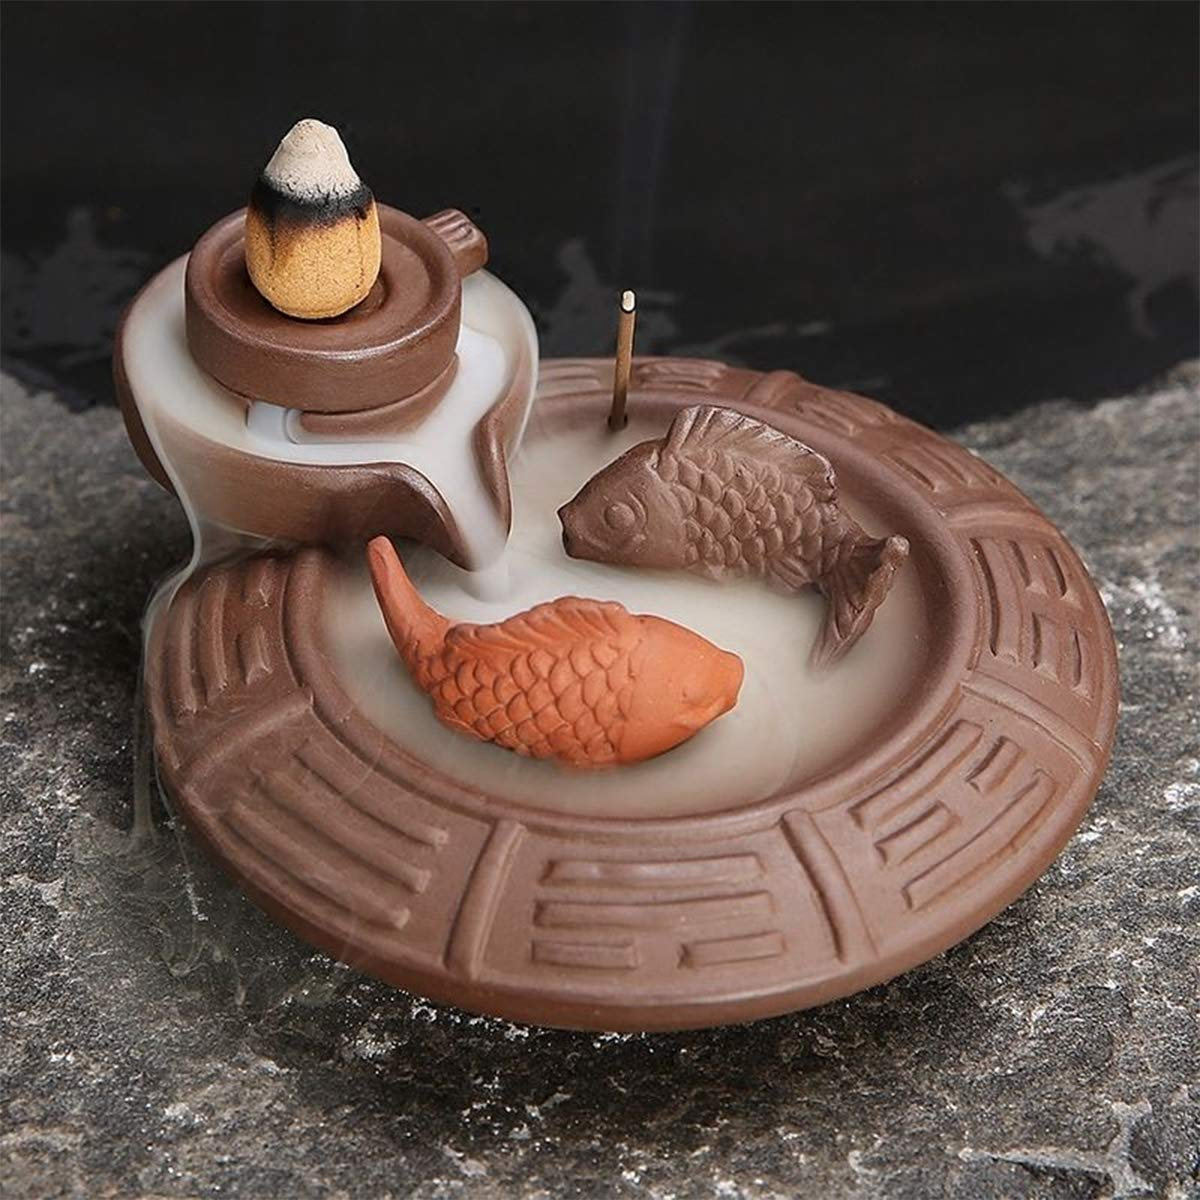 Jeteven Waterfall Backflow Incense Burner Sticks Holder Yoga Room Home Decoration & Handicraft Gift (Ceramic Fish)